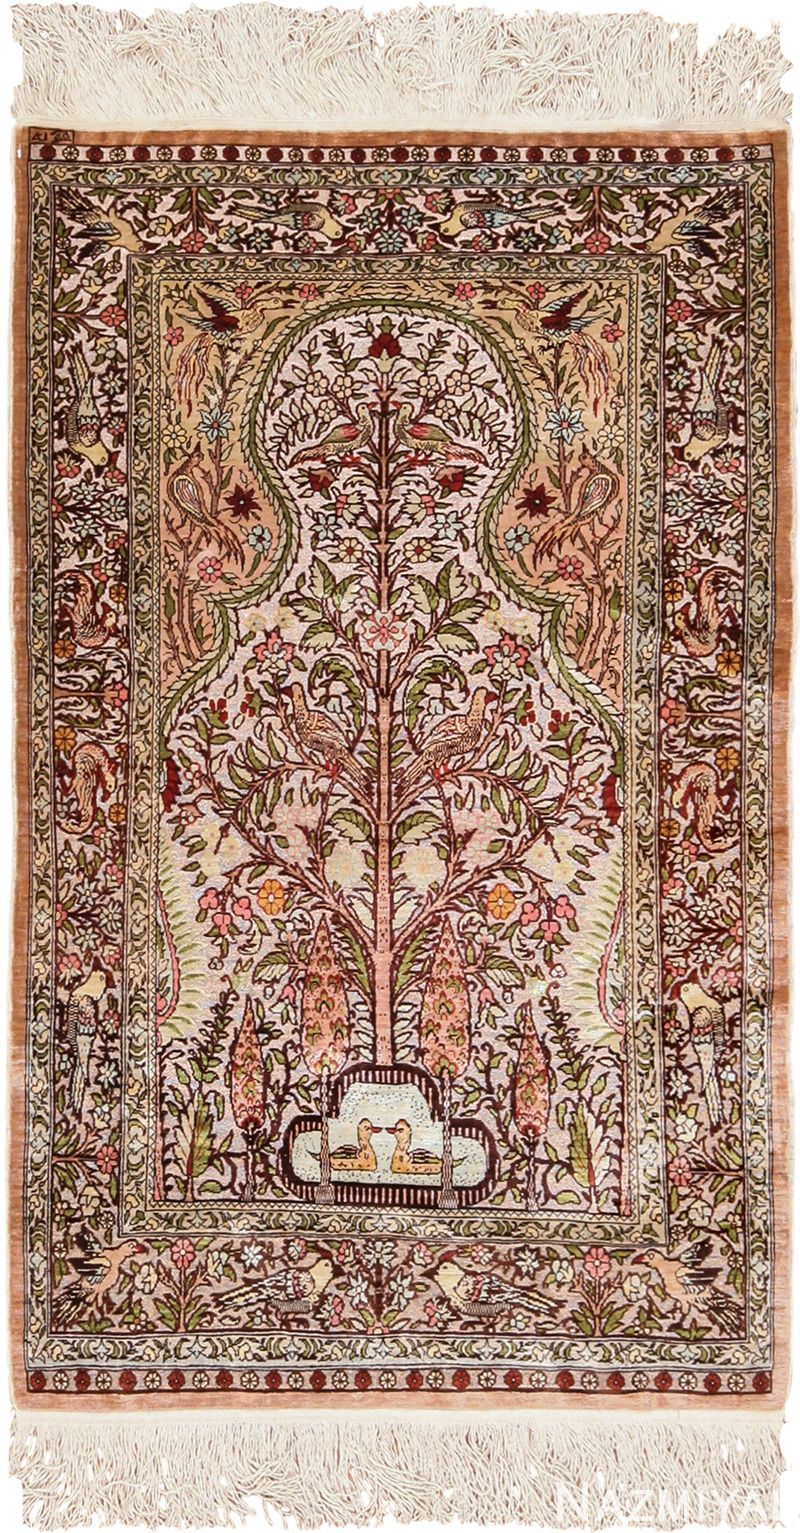 Metallic And Silk Souf Tree Of Life Hereke Turkish Prayer Rug 49612 Trendy Tree Family Tree Collage Tree House Drawing